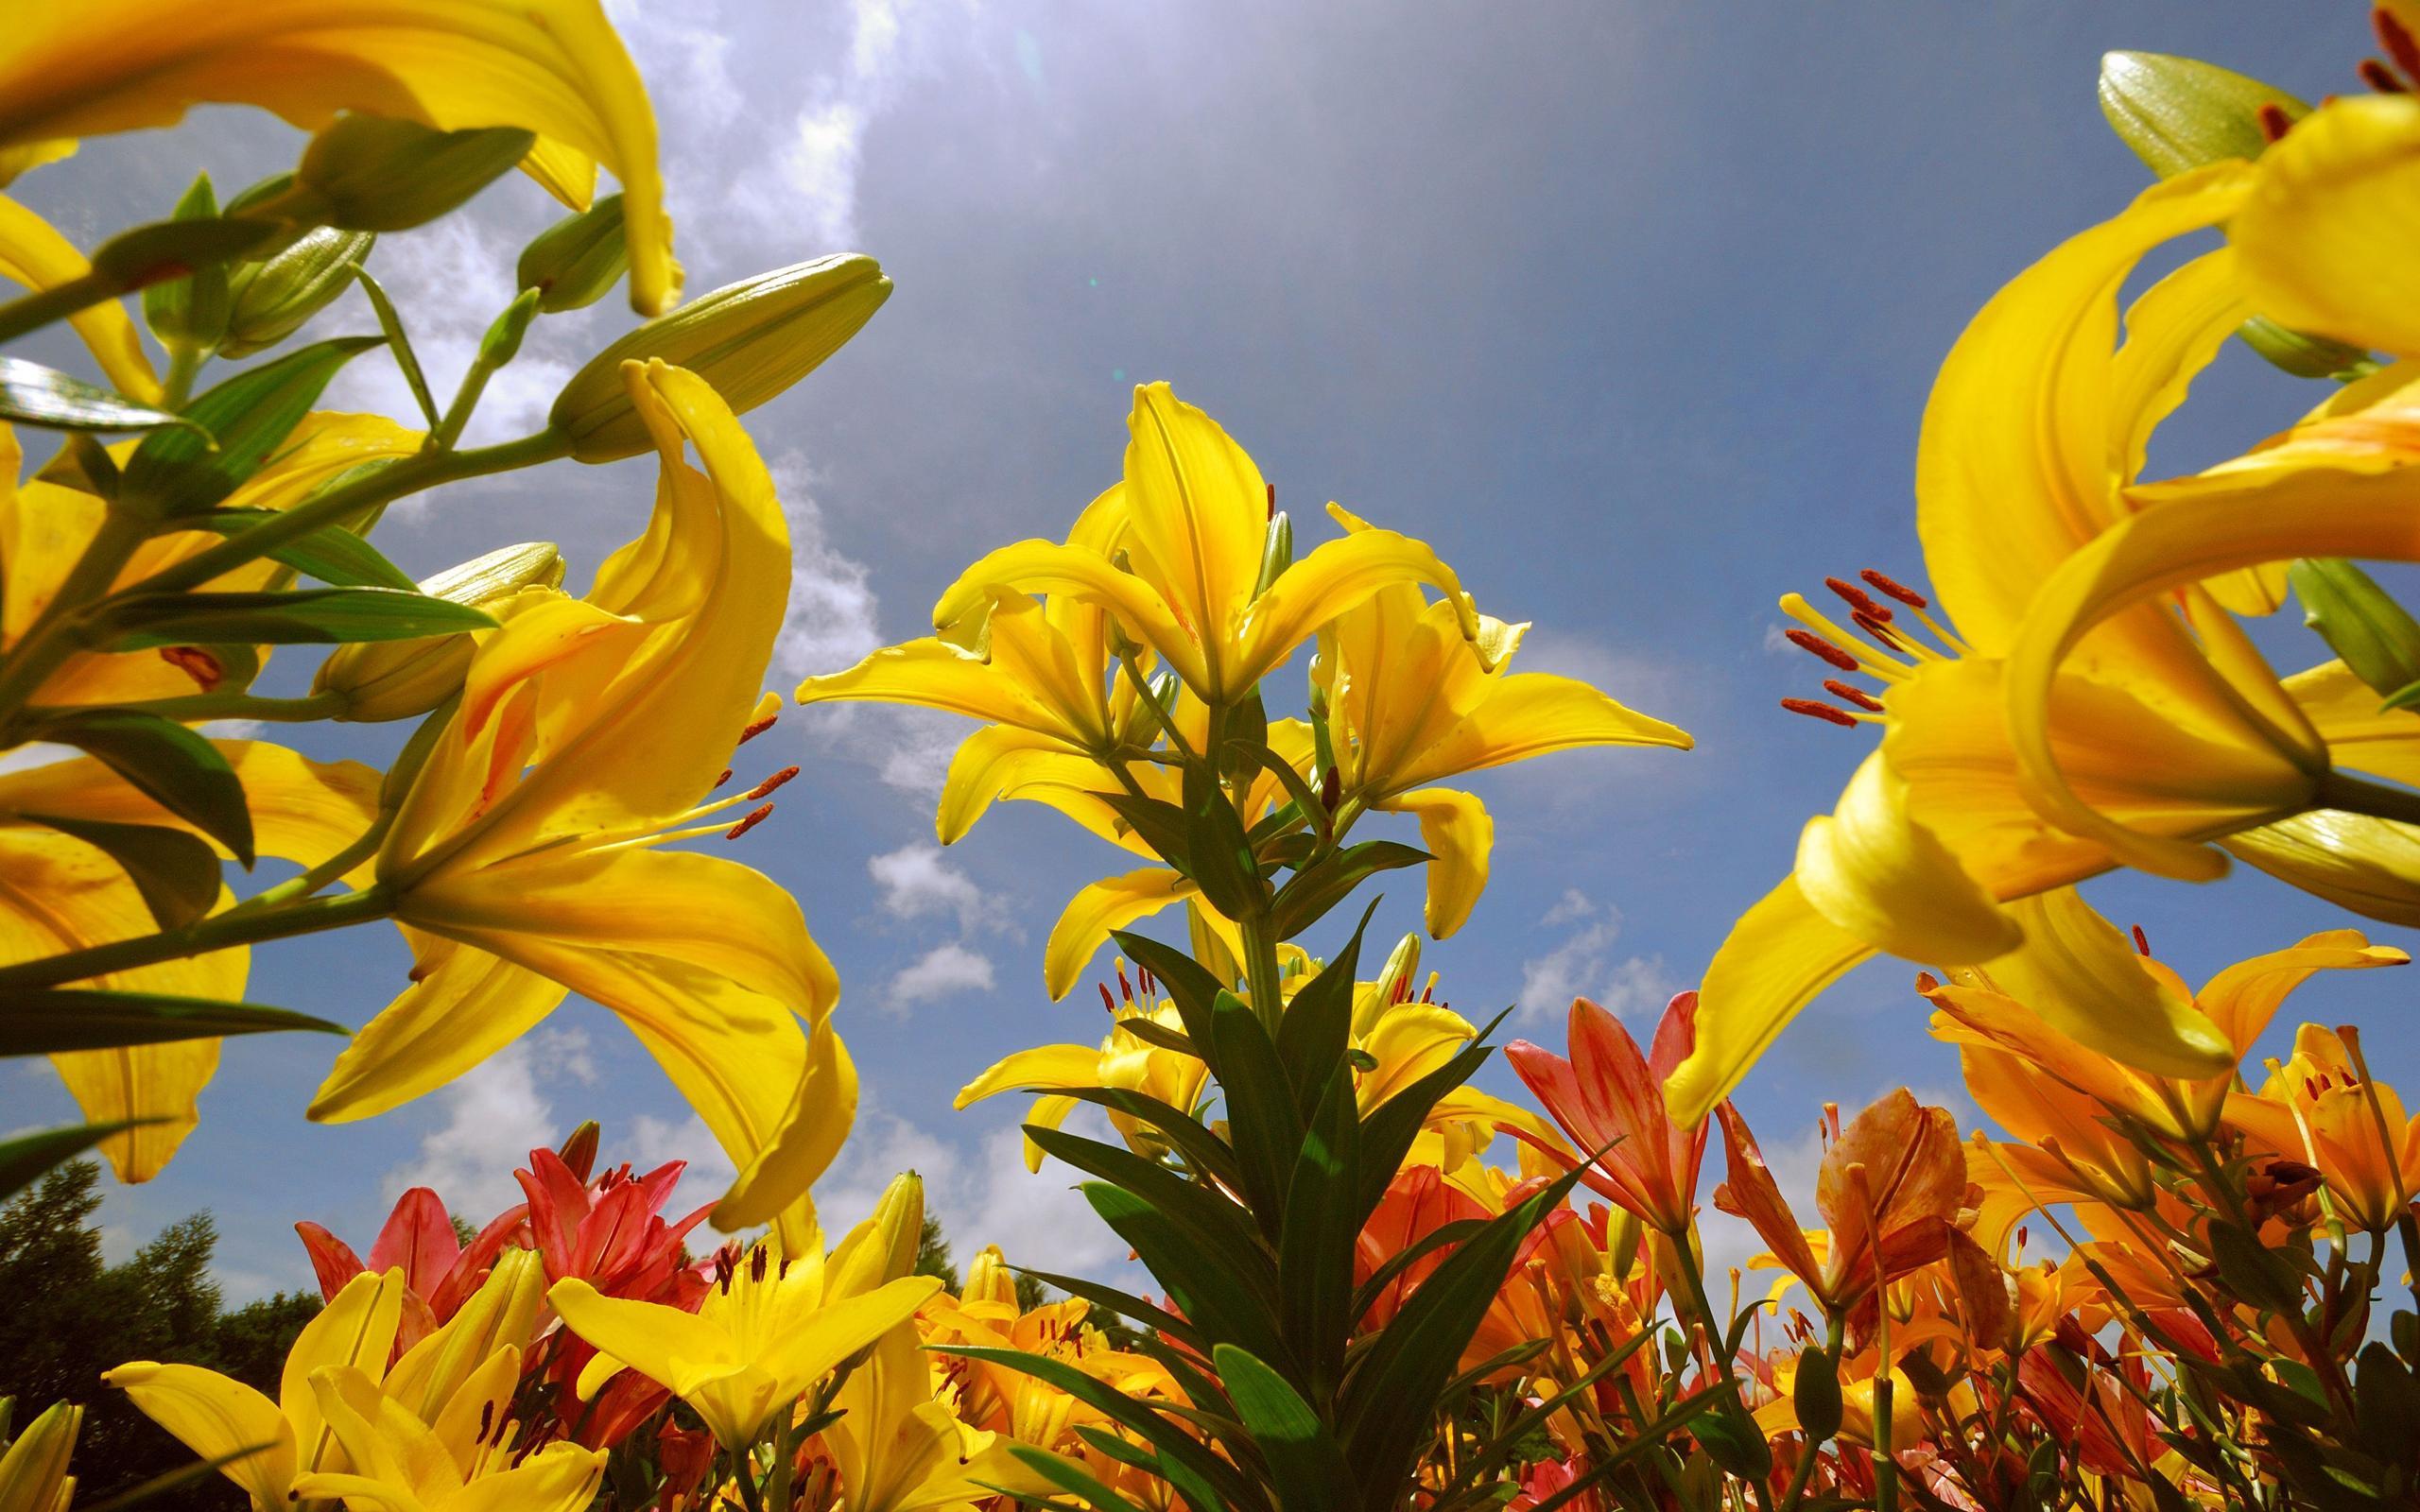 Hd Summer Lily Flower , HD Wallpaper & Backgrounds